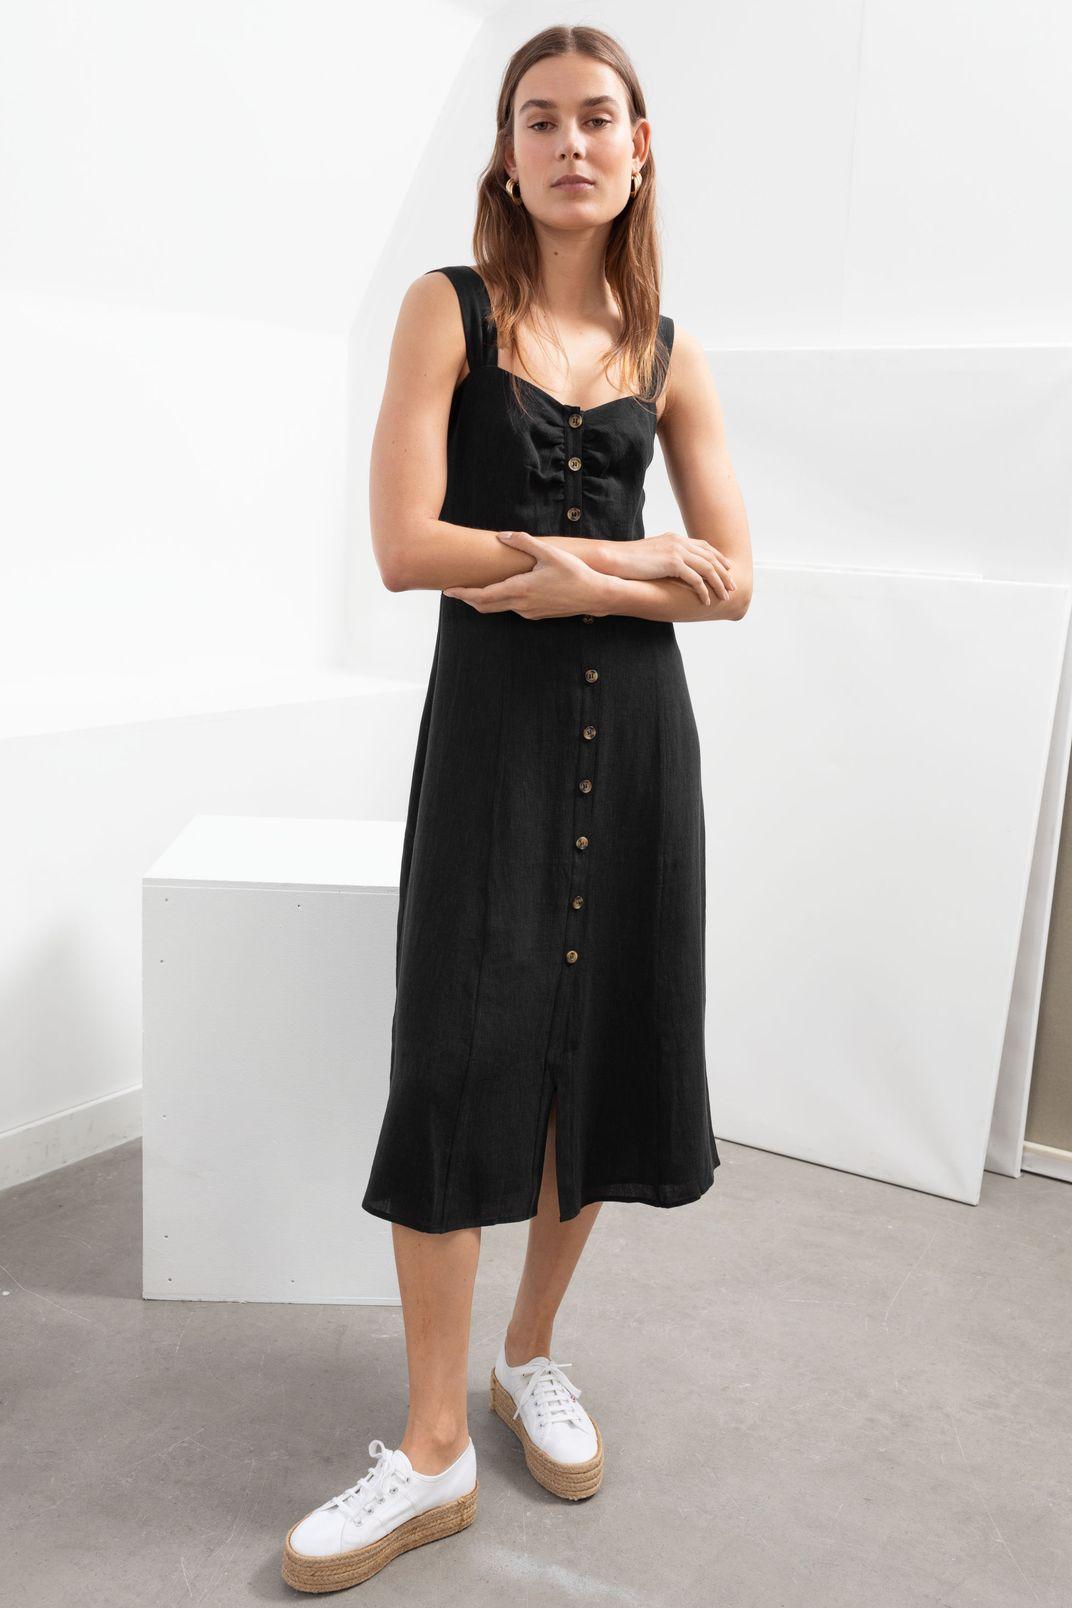 & Other Stories Linen Blend Midi Dress